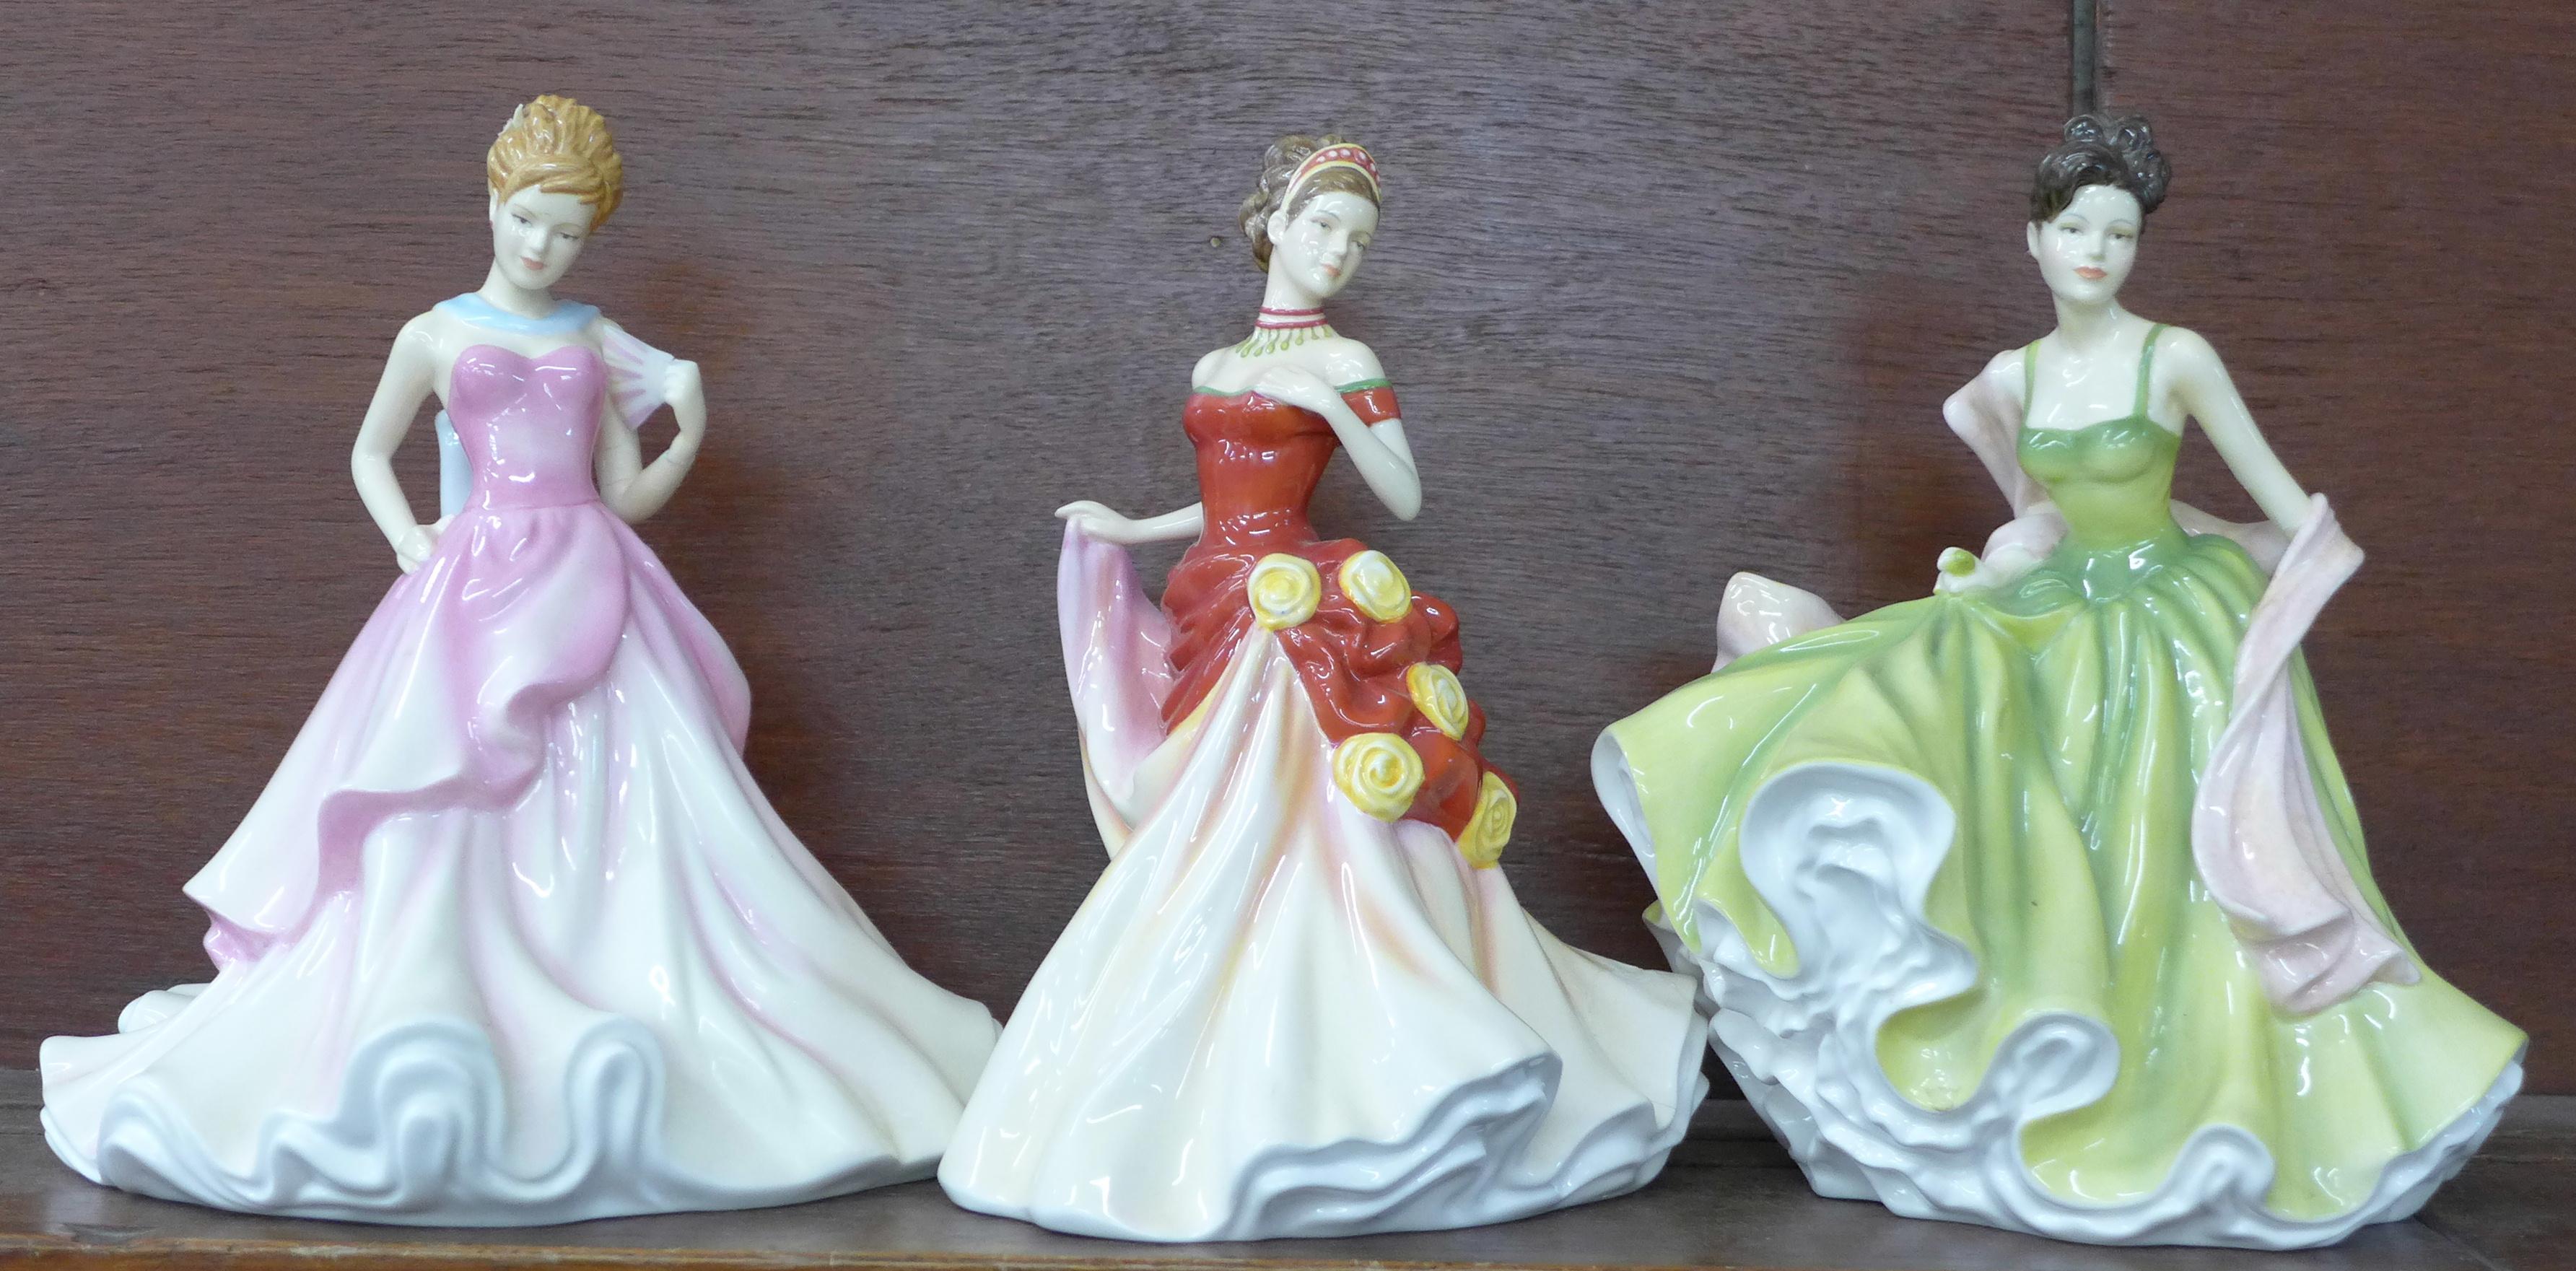 Lot 625 - Three Royal Doulton Pretty Ladies figures, Spring Ball, Autumn Ball and Summer Ball,